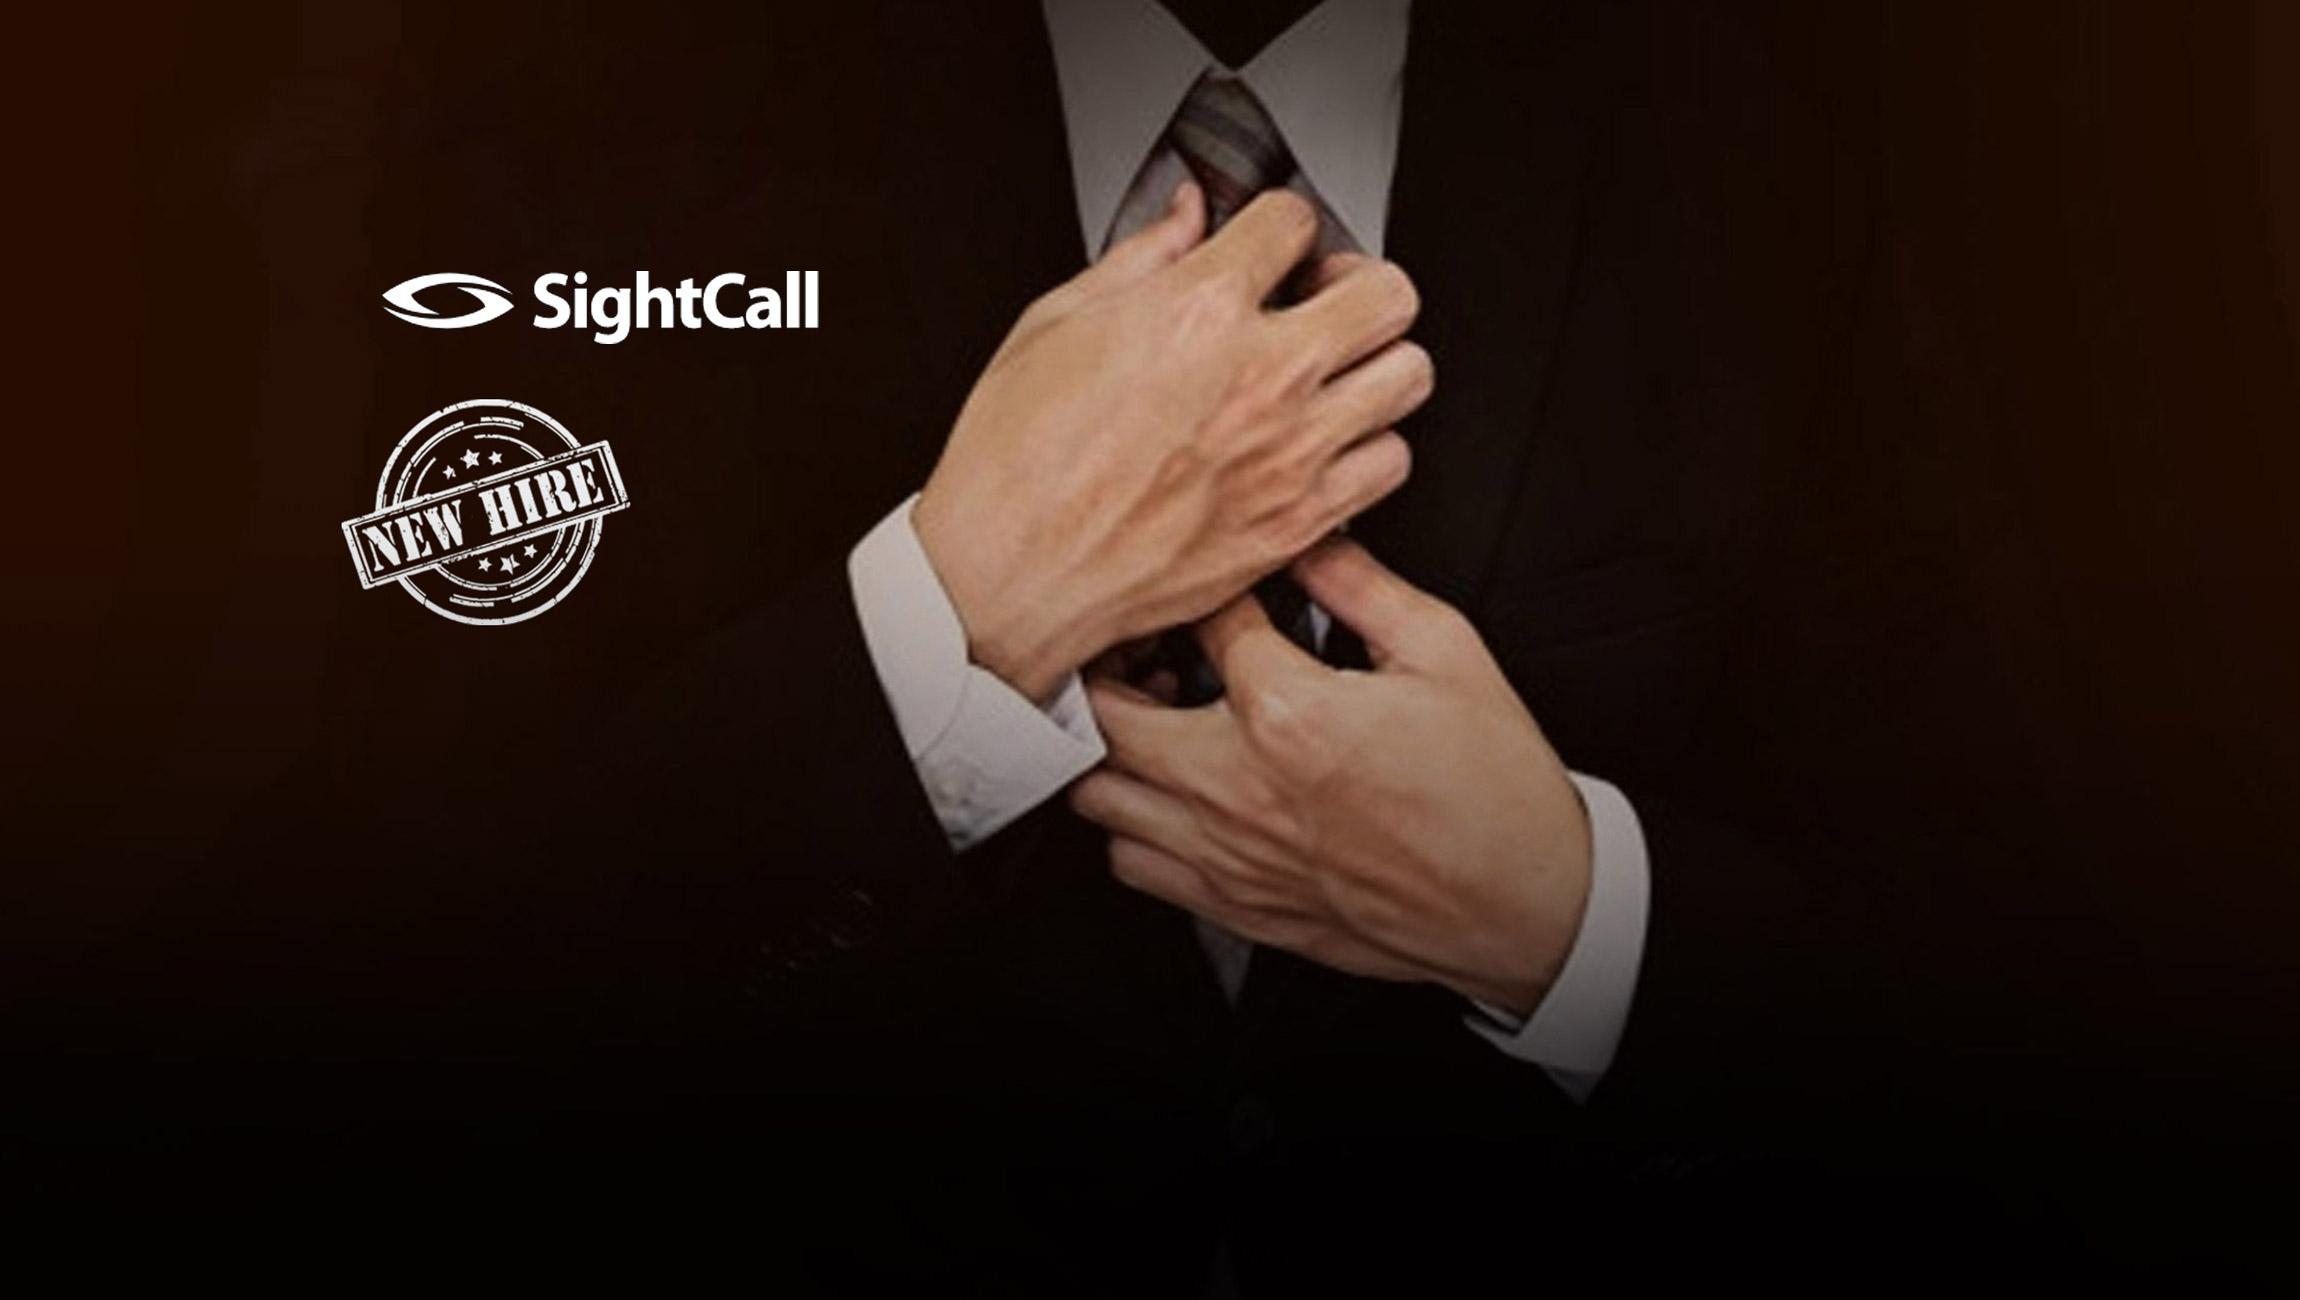 SightCall-Appoints-Dipak-Joshi-as-New-Group-CFO